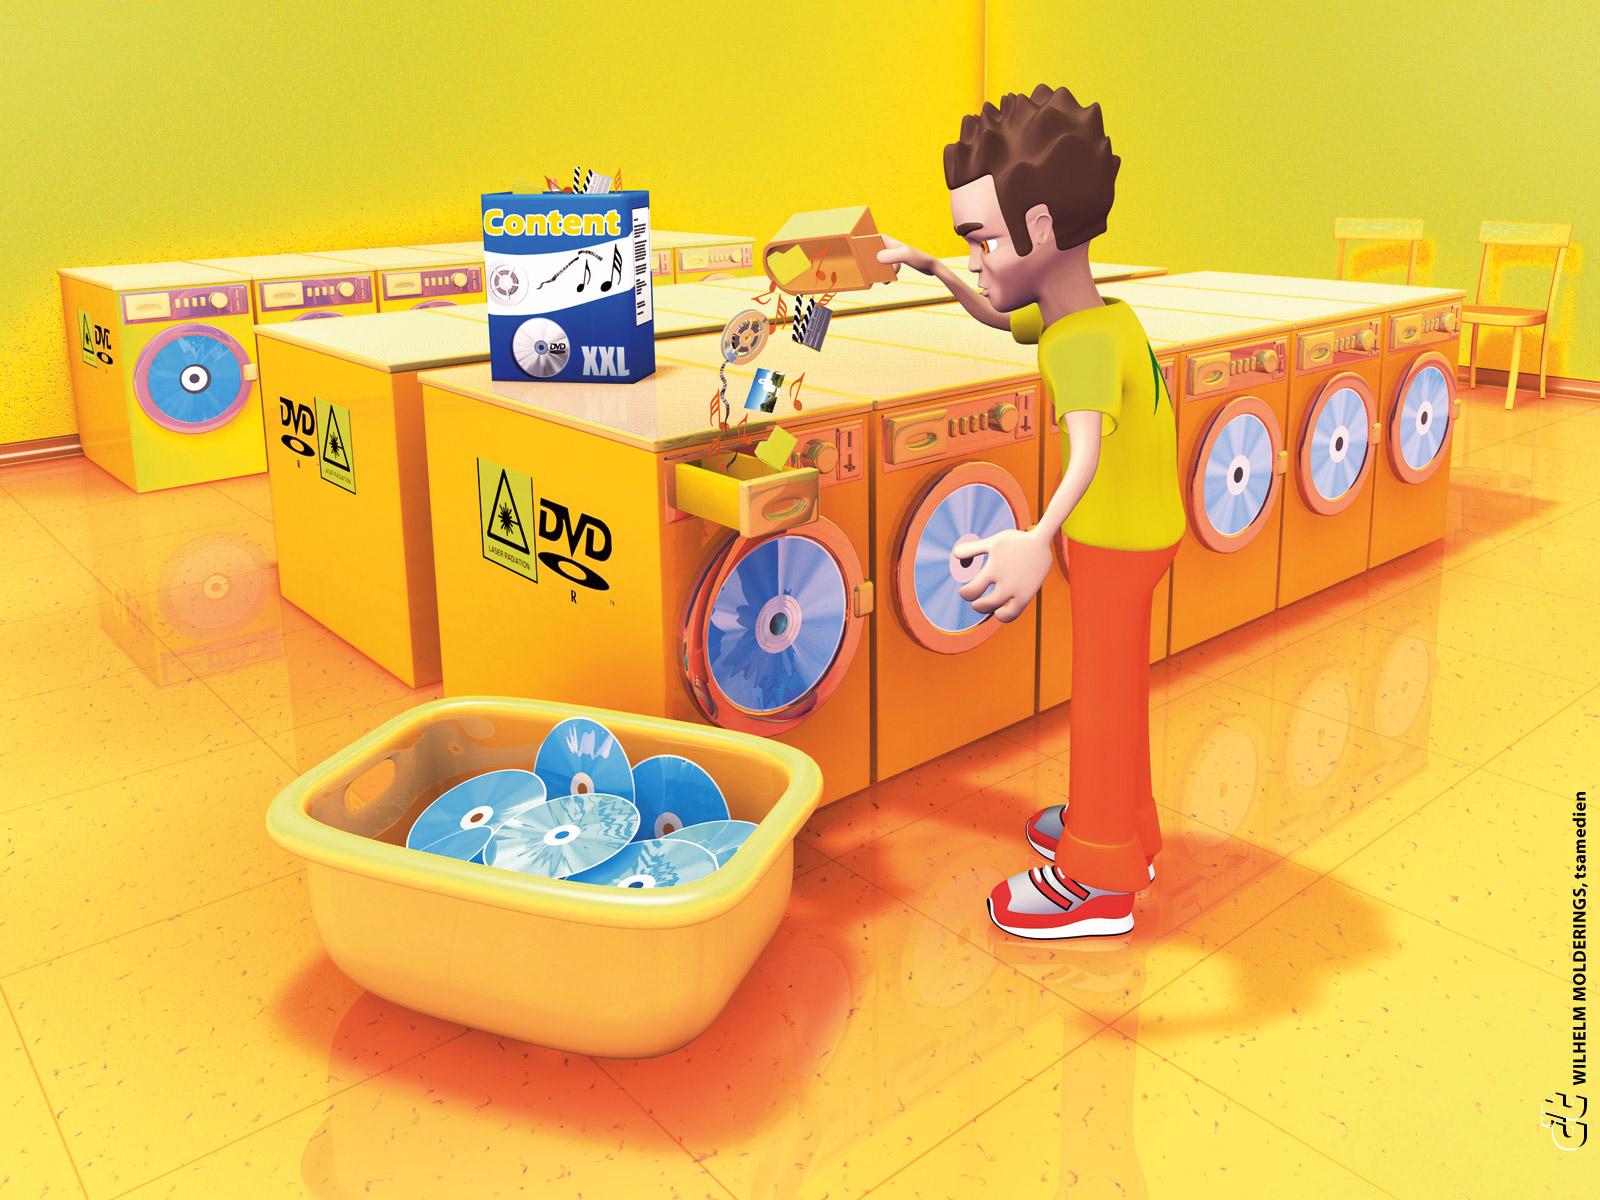 http://3.bp.blogspot.com/_m1Z6uxpmlU8/TLtaSYzsrnI/AAAAAAAAB3I/7ESXNGe2Ttk/s1600/DVD_REC_Self-Service_Laundry.jpg